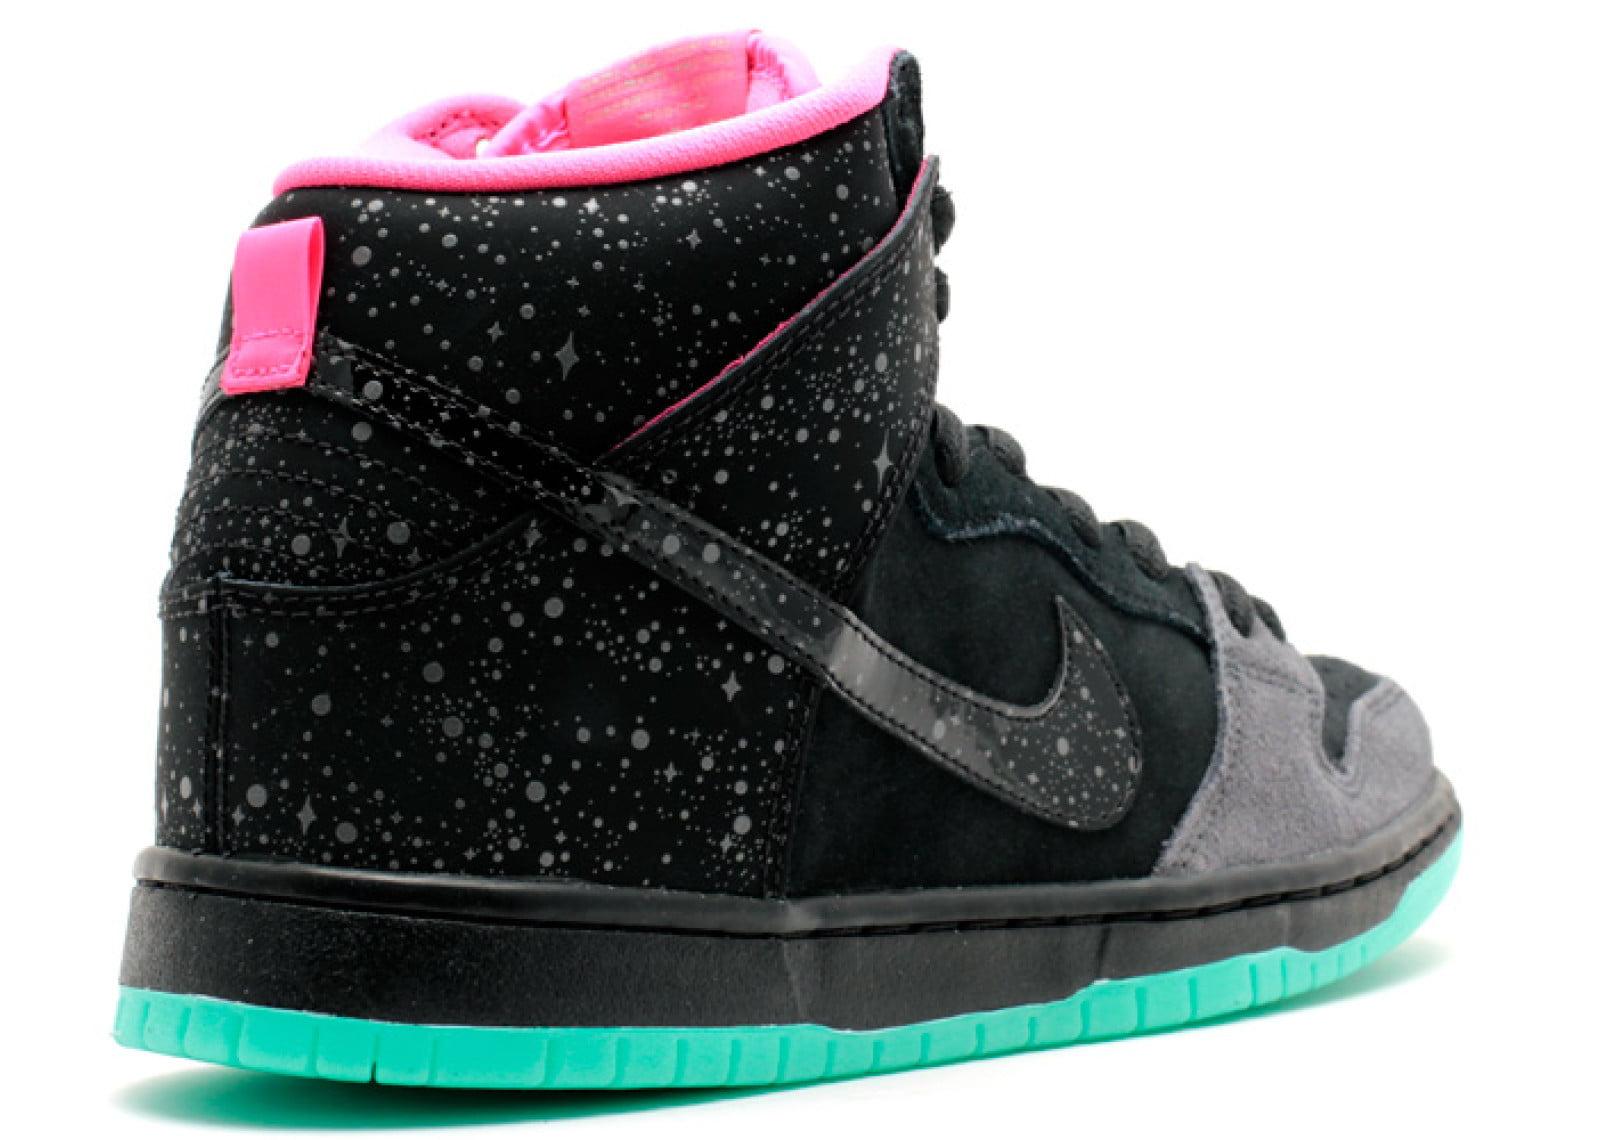 best sneakers 02fde 31e38 ... closeout nike dunk high premium sb northern lights 313171 063 walmart  ebf98 a897a